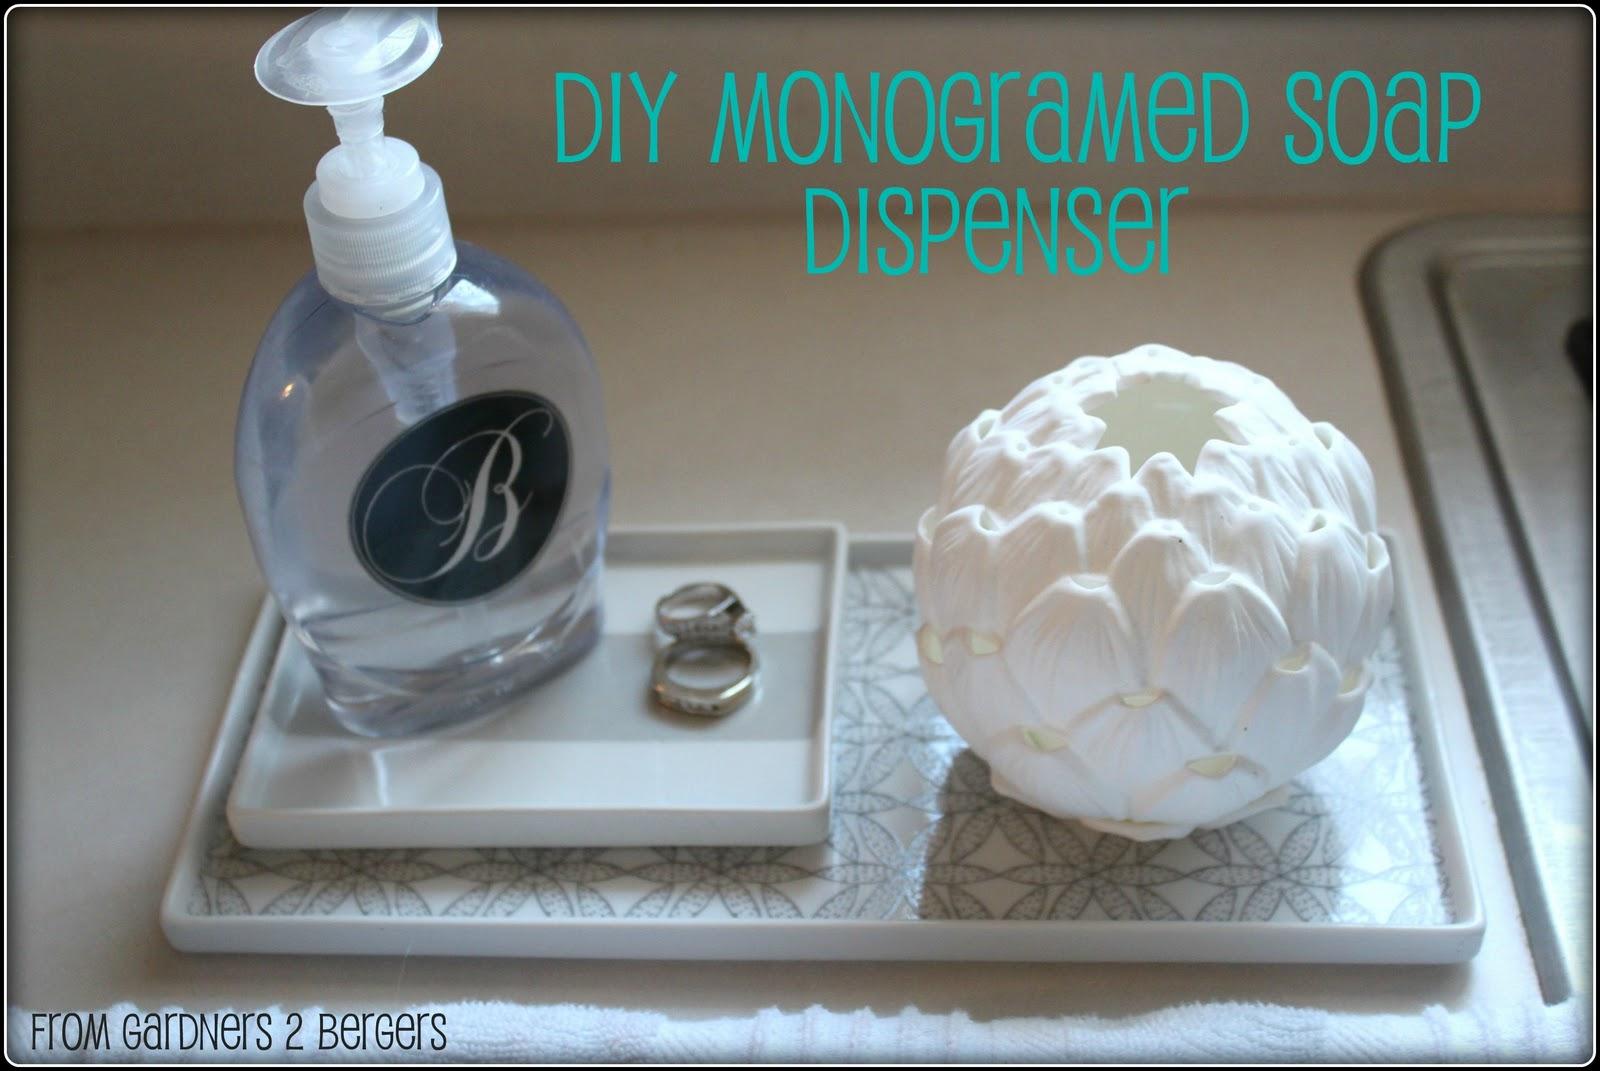 Monogramed-Soap-Dispensers-Tutorial